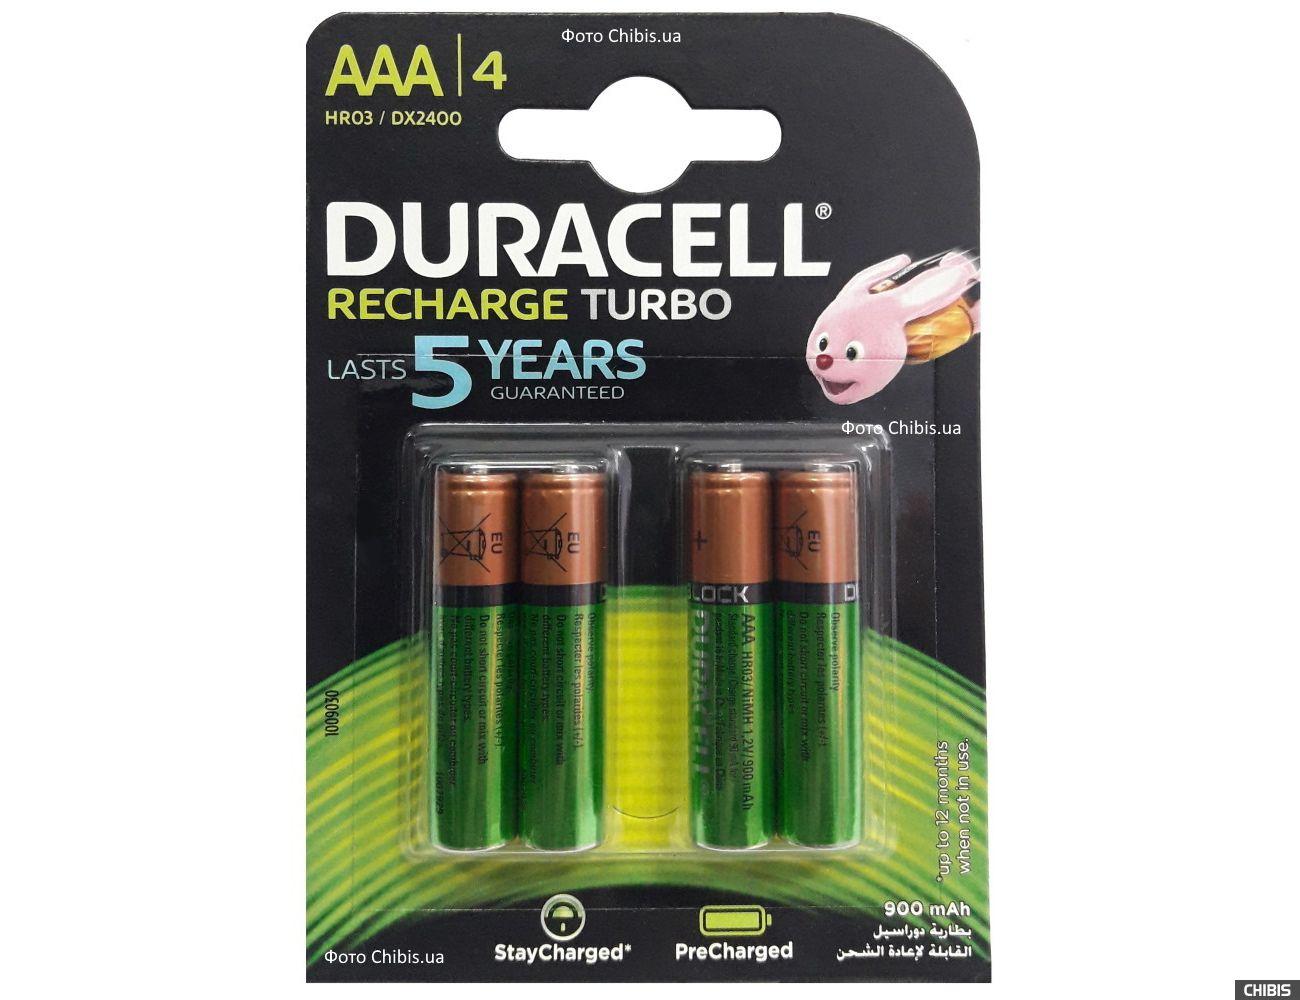 Аккумуляторы Дюрасел ААА 900 mAh HR03, Ni-Mh, 1.2V 4 шт.